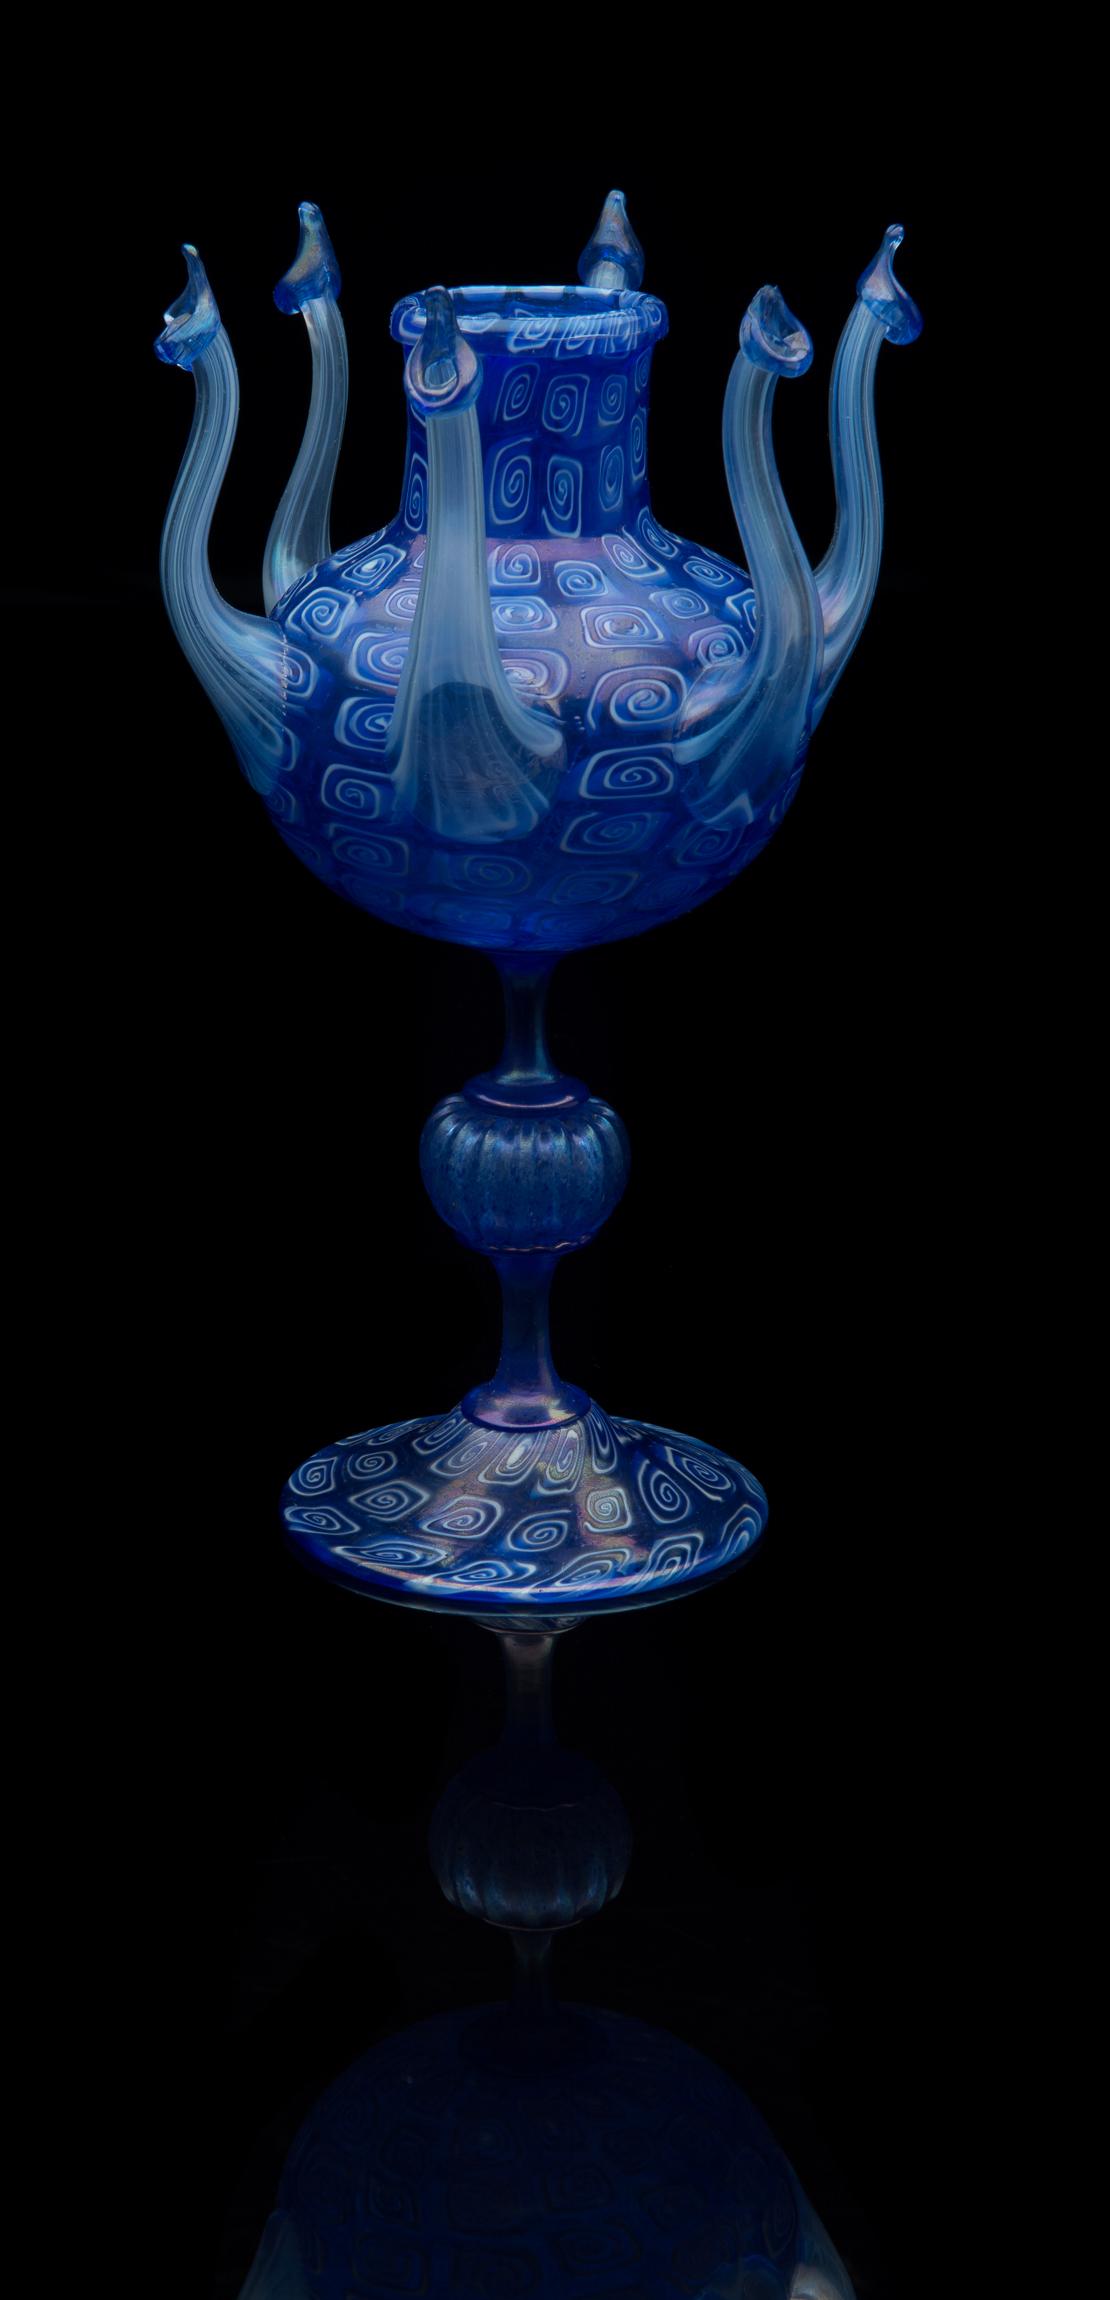 Fratelli Toso,  Murrhine Octopus Form Vase  (circa 1895, glass, 9 1/8 inches), VV.408